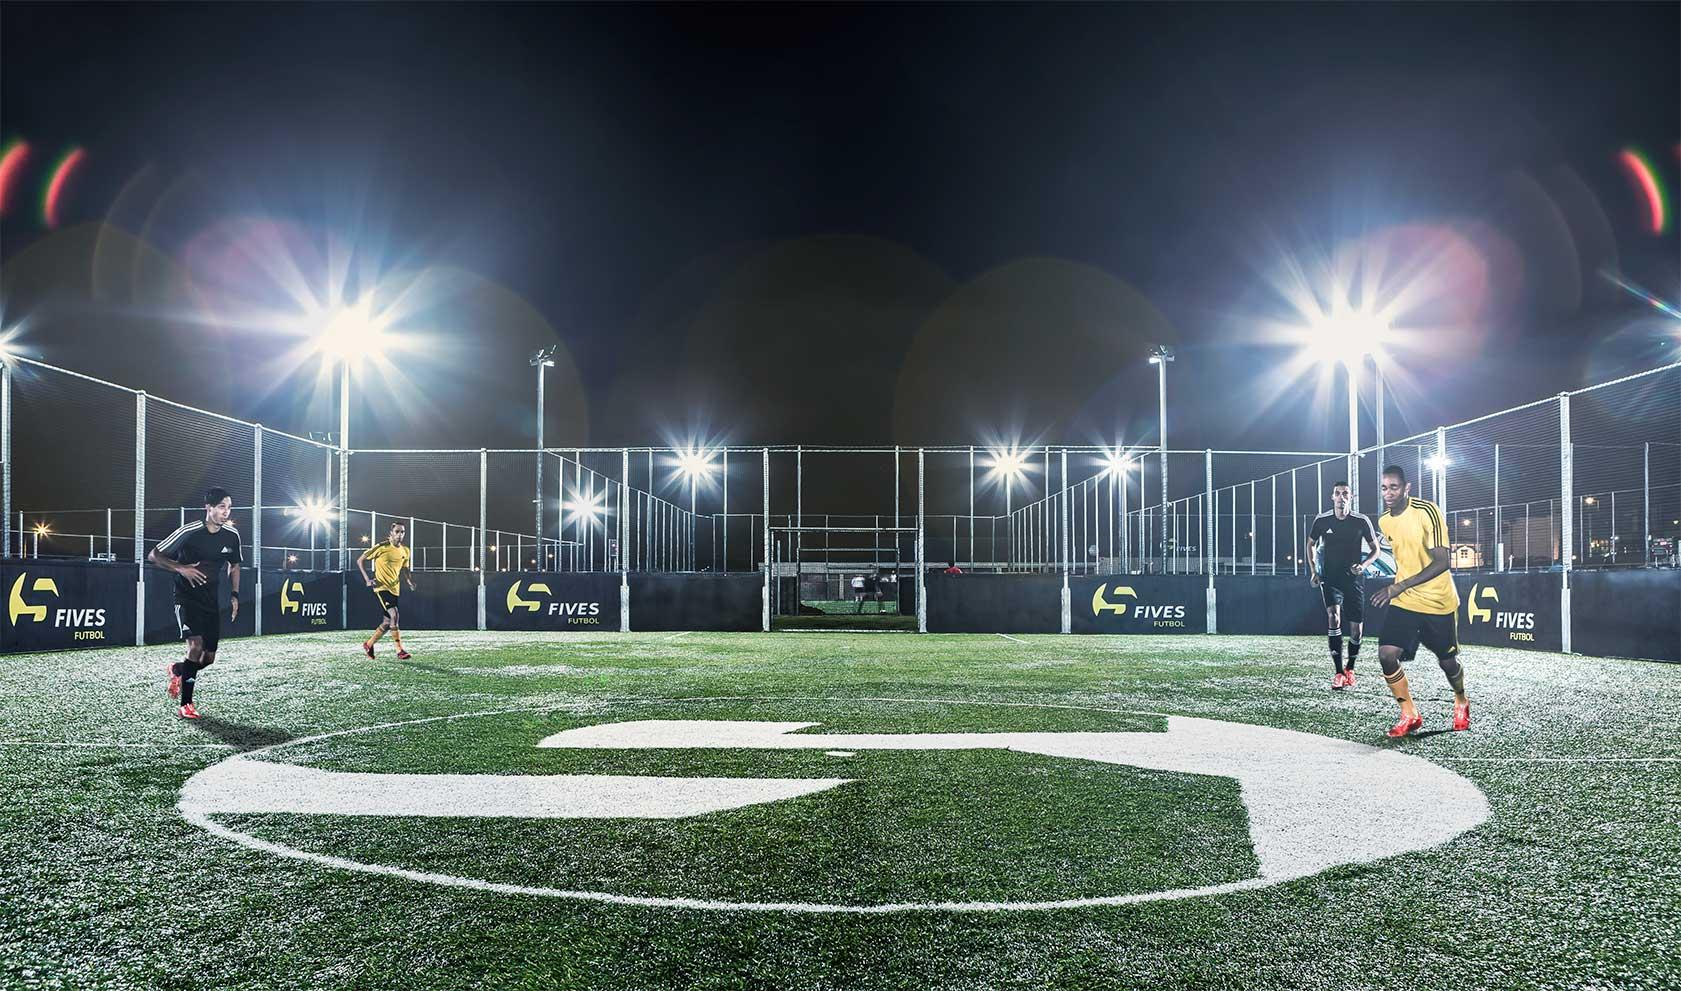 Fives Futbol Area Girls Get To Shine